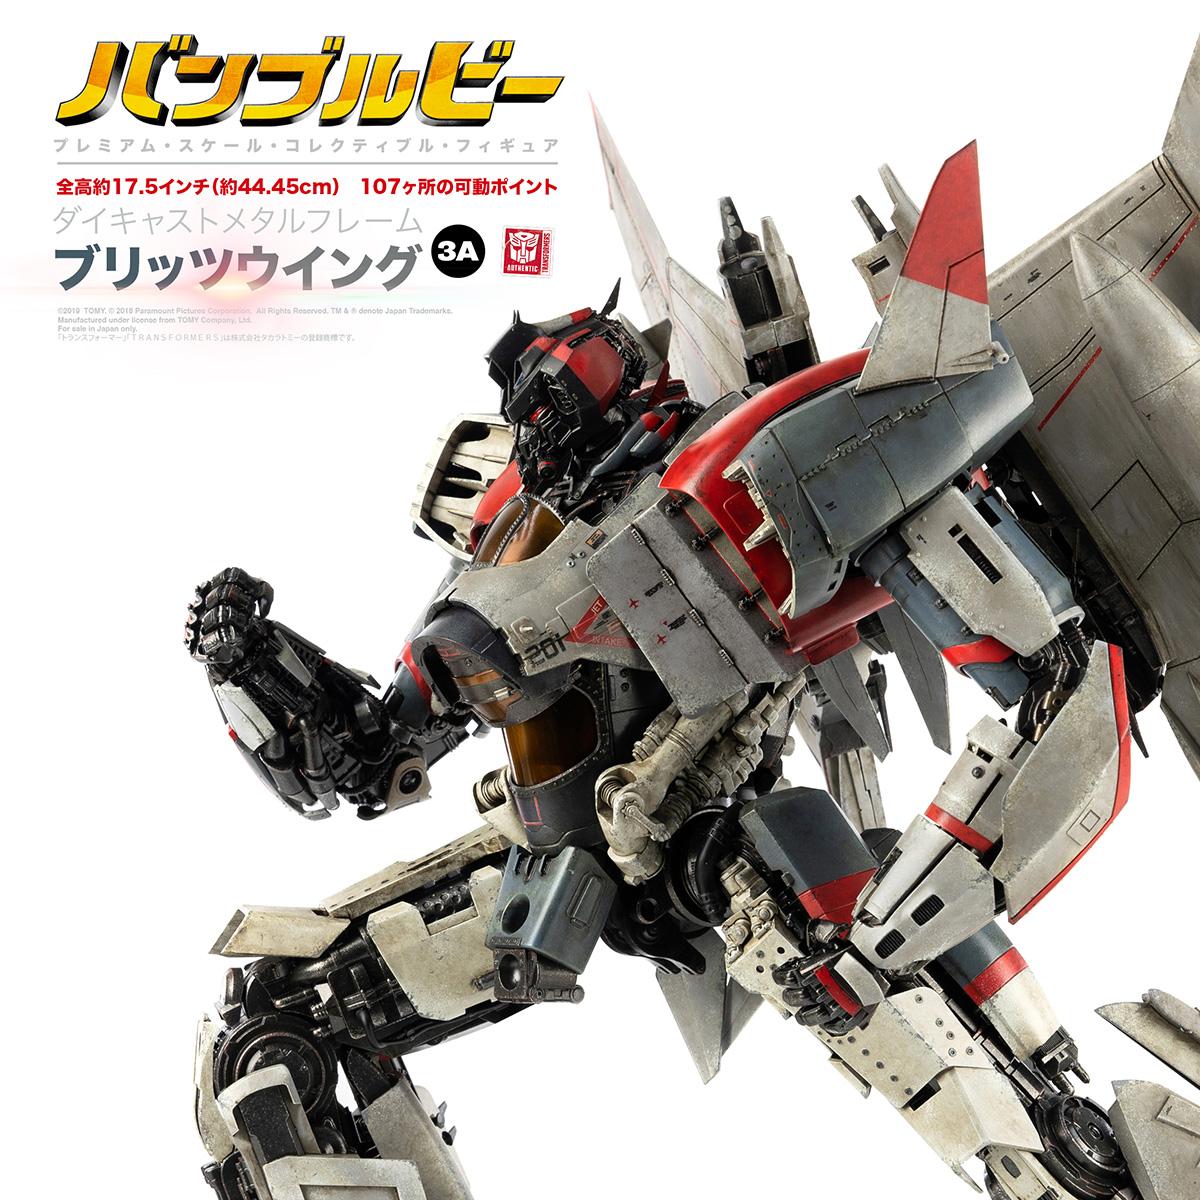 Blitzwing_PM_JAP_0962.jpg